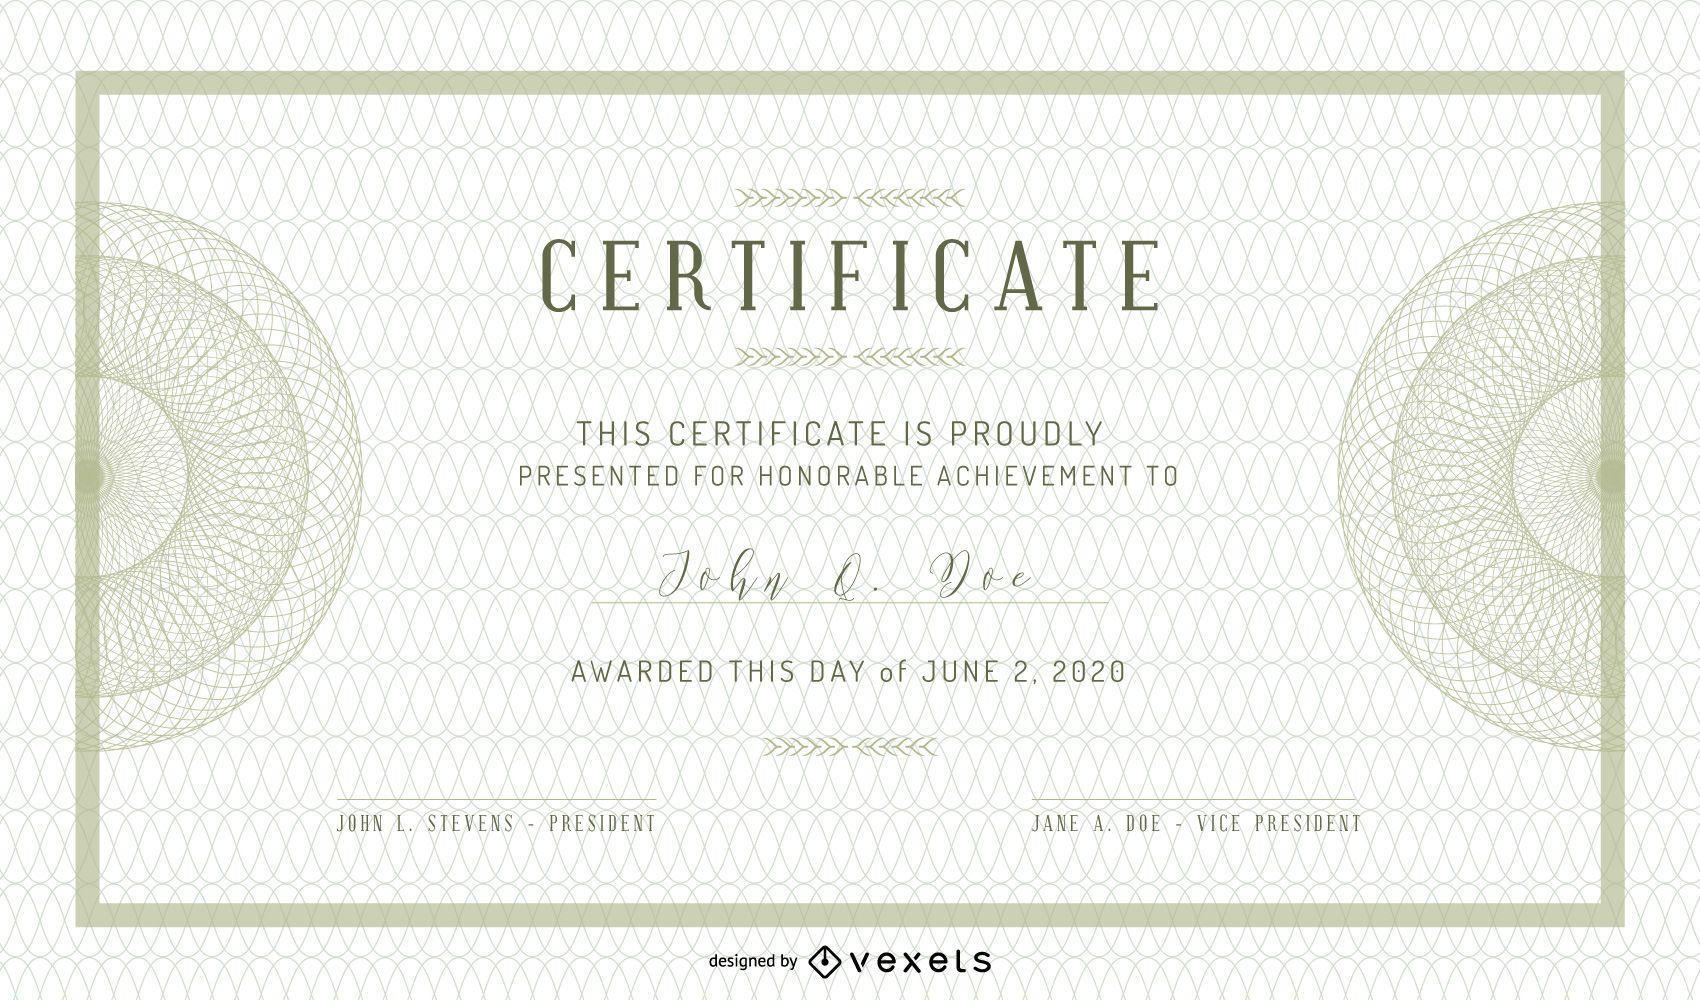 Diploma Certificate Design Template